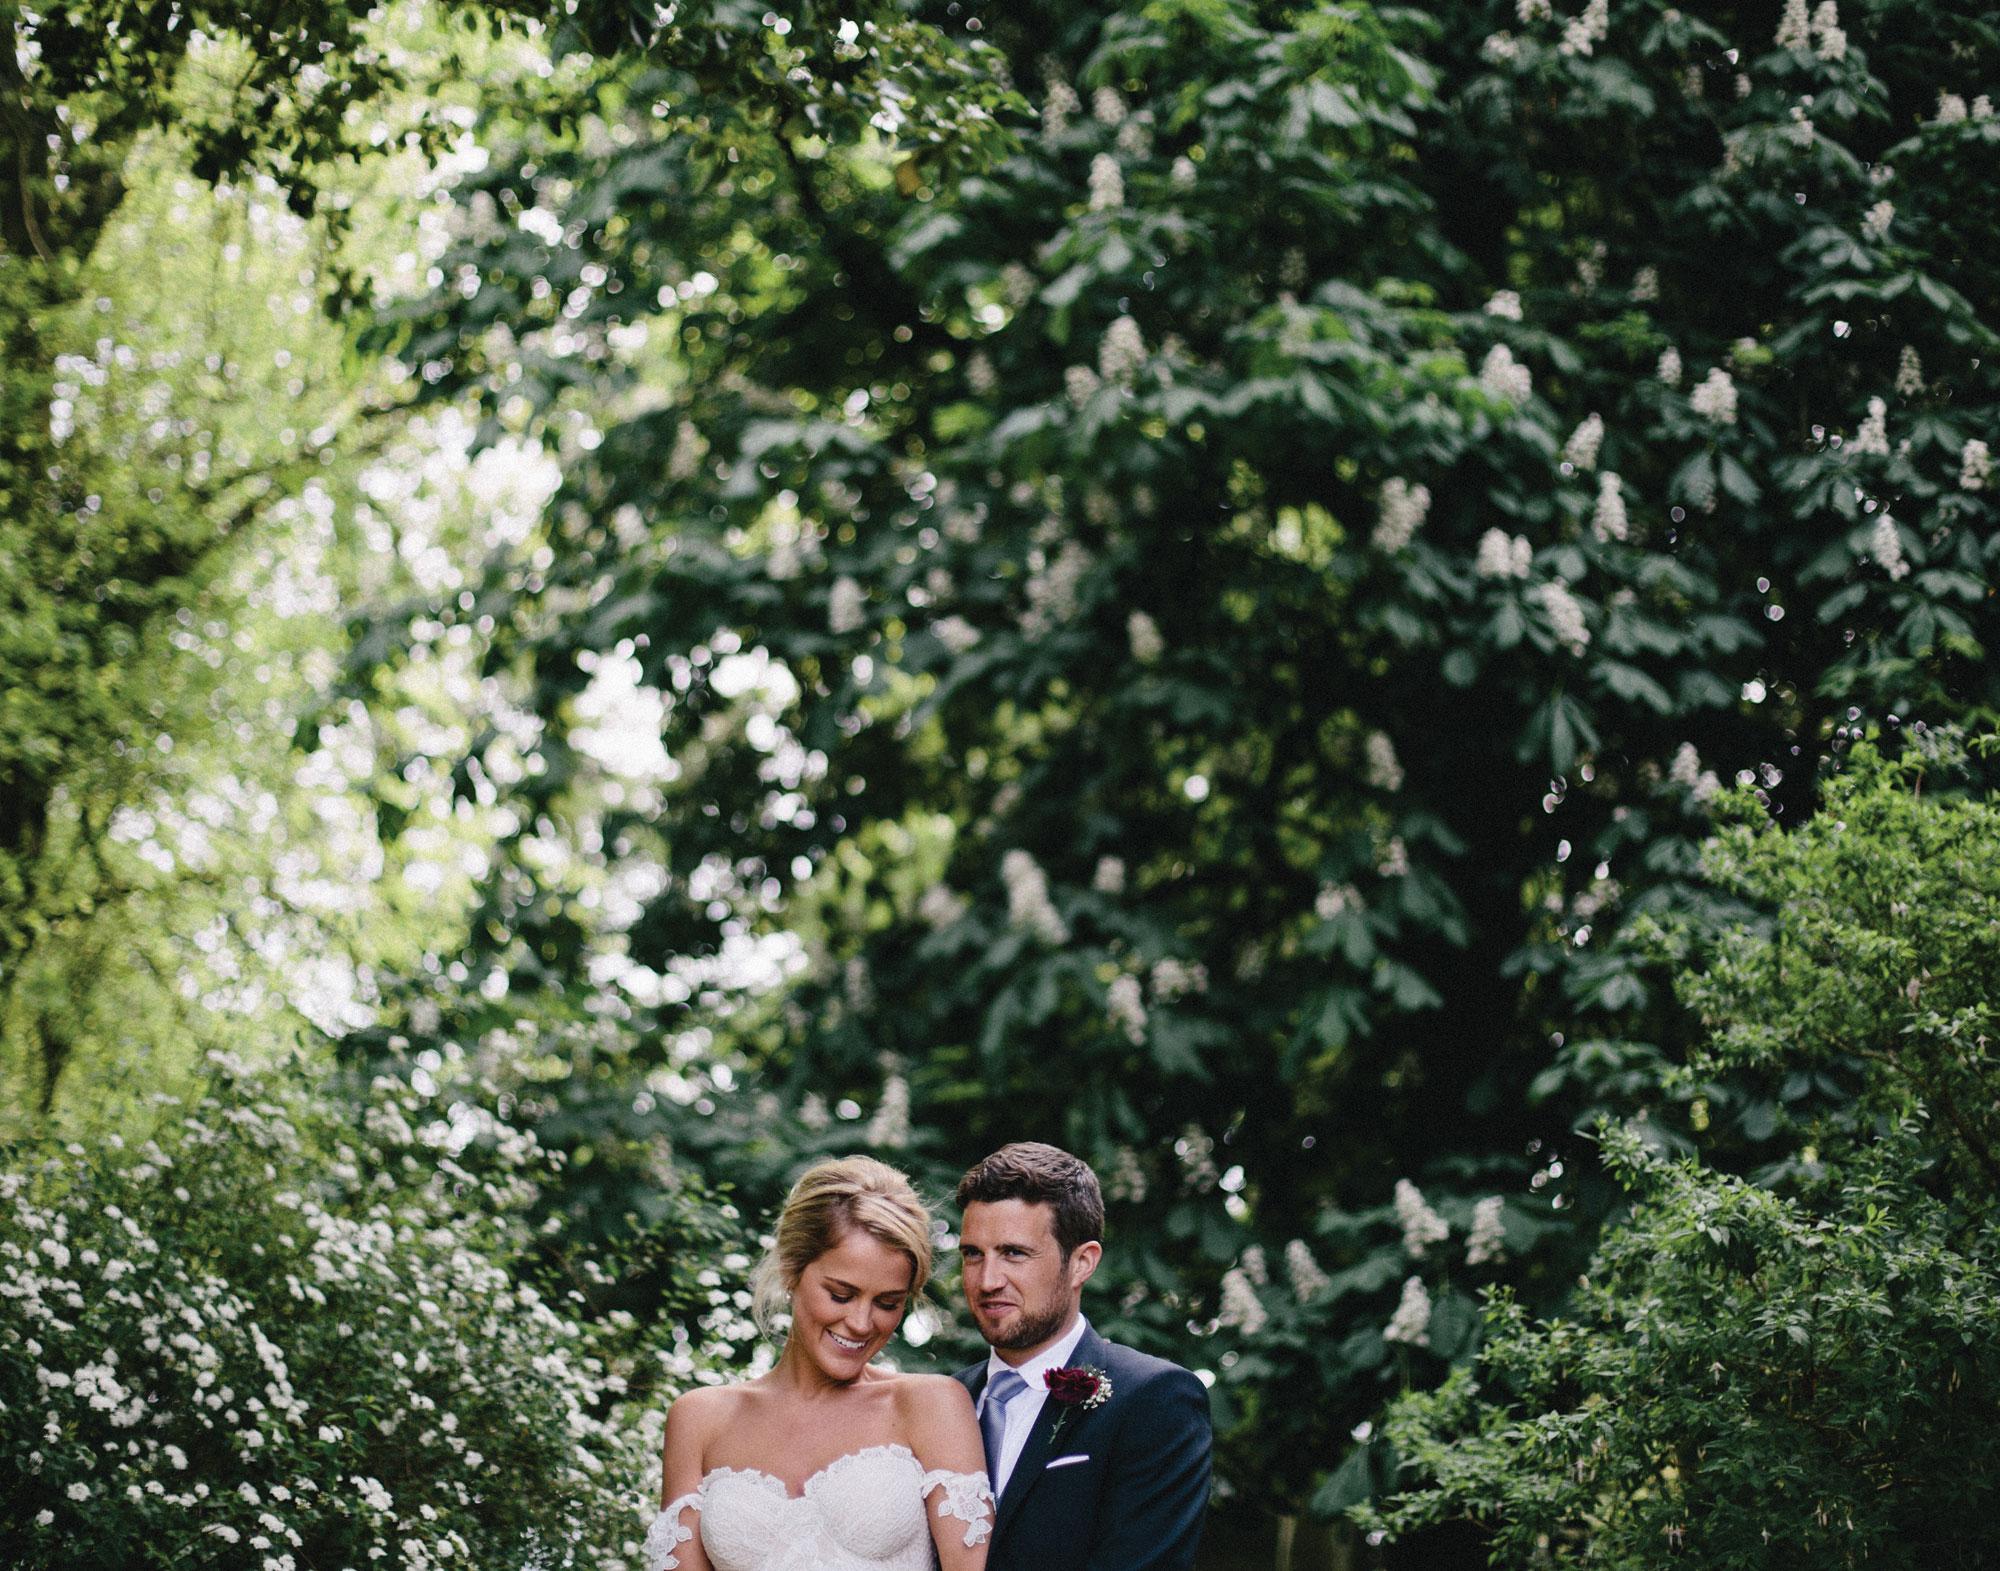 modern-bride-and-groom-wedding-photography-laura-curran-photography-ireland.jpg